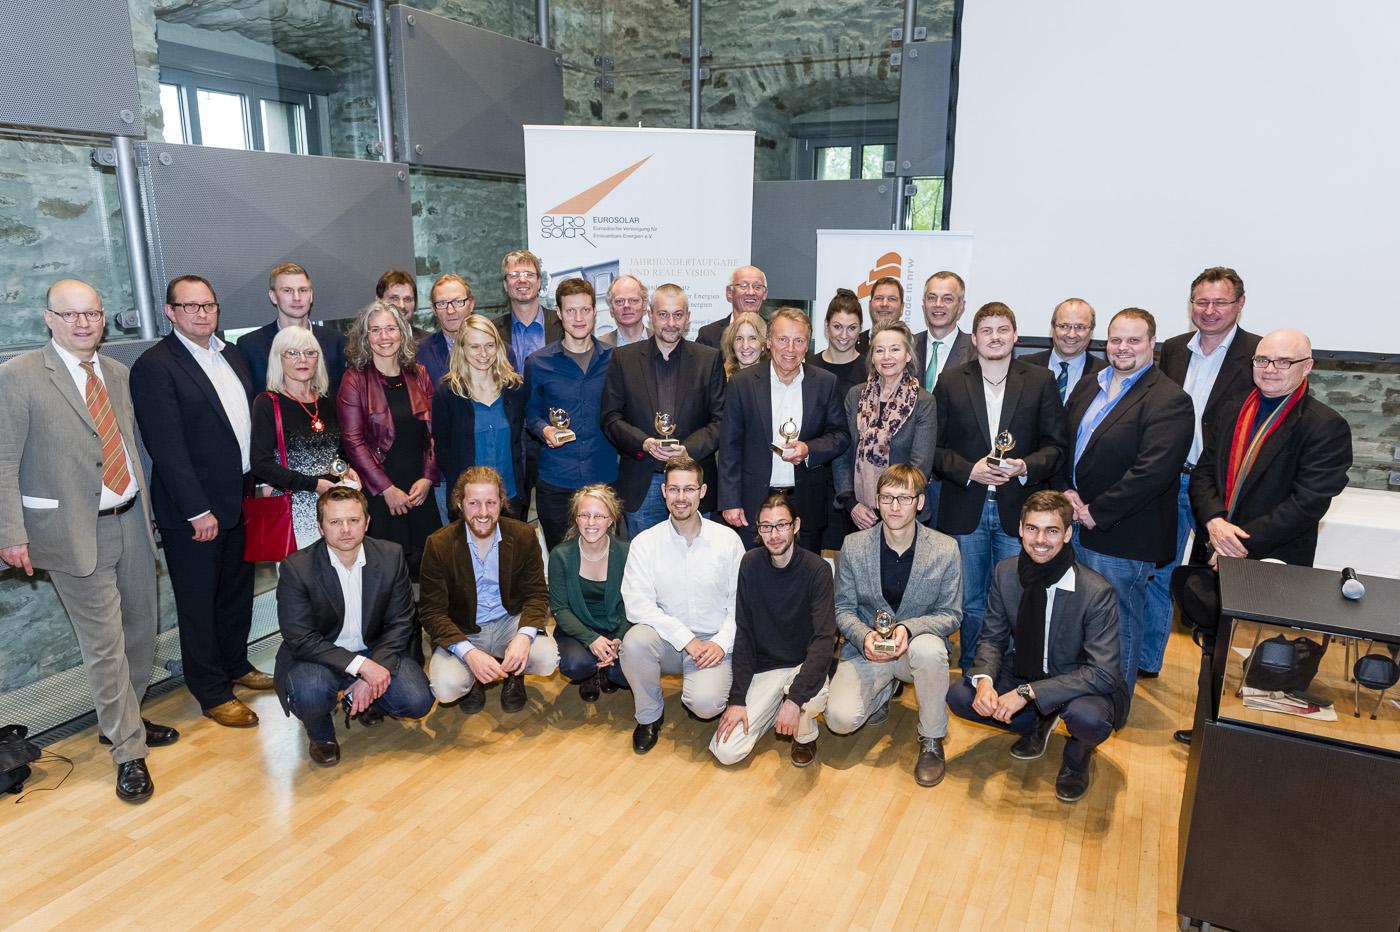 deutscher-solarpreis-2014-daniel-schmitt-alle-preistraeger